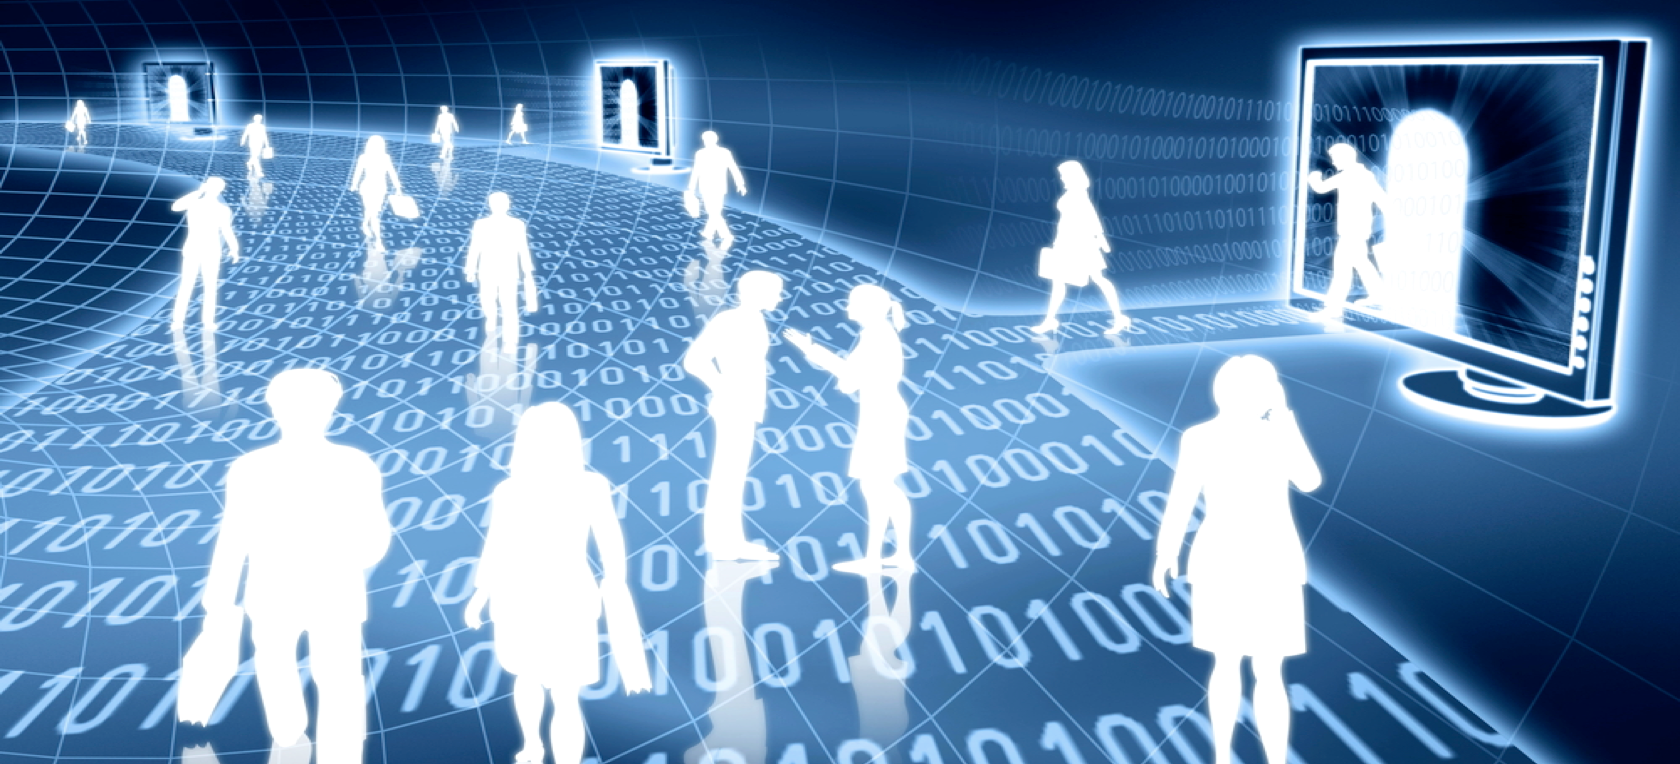 Cisco Announces New Digital Network Architecture - Faster Customer Digital  Transformation   Transfz